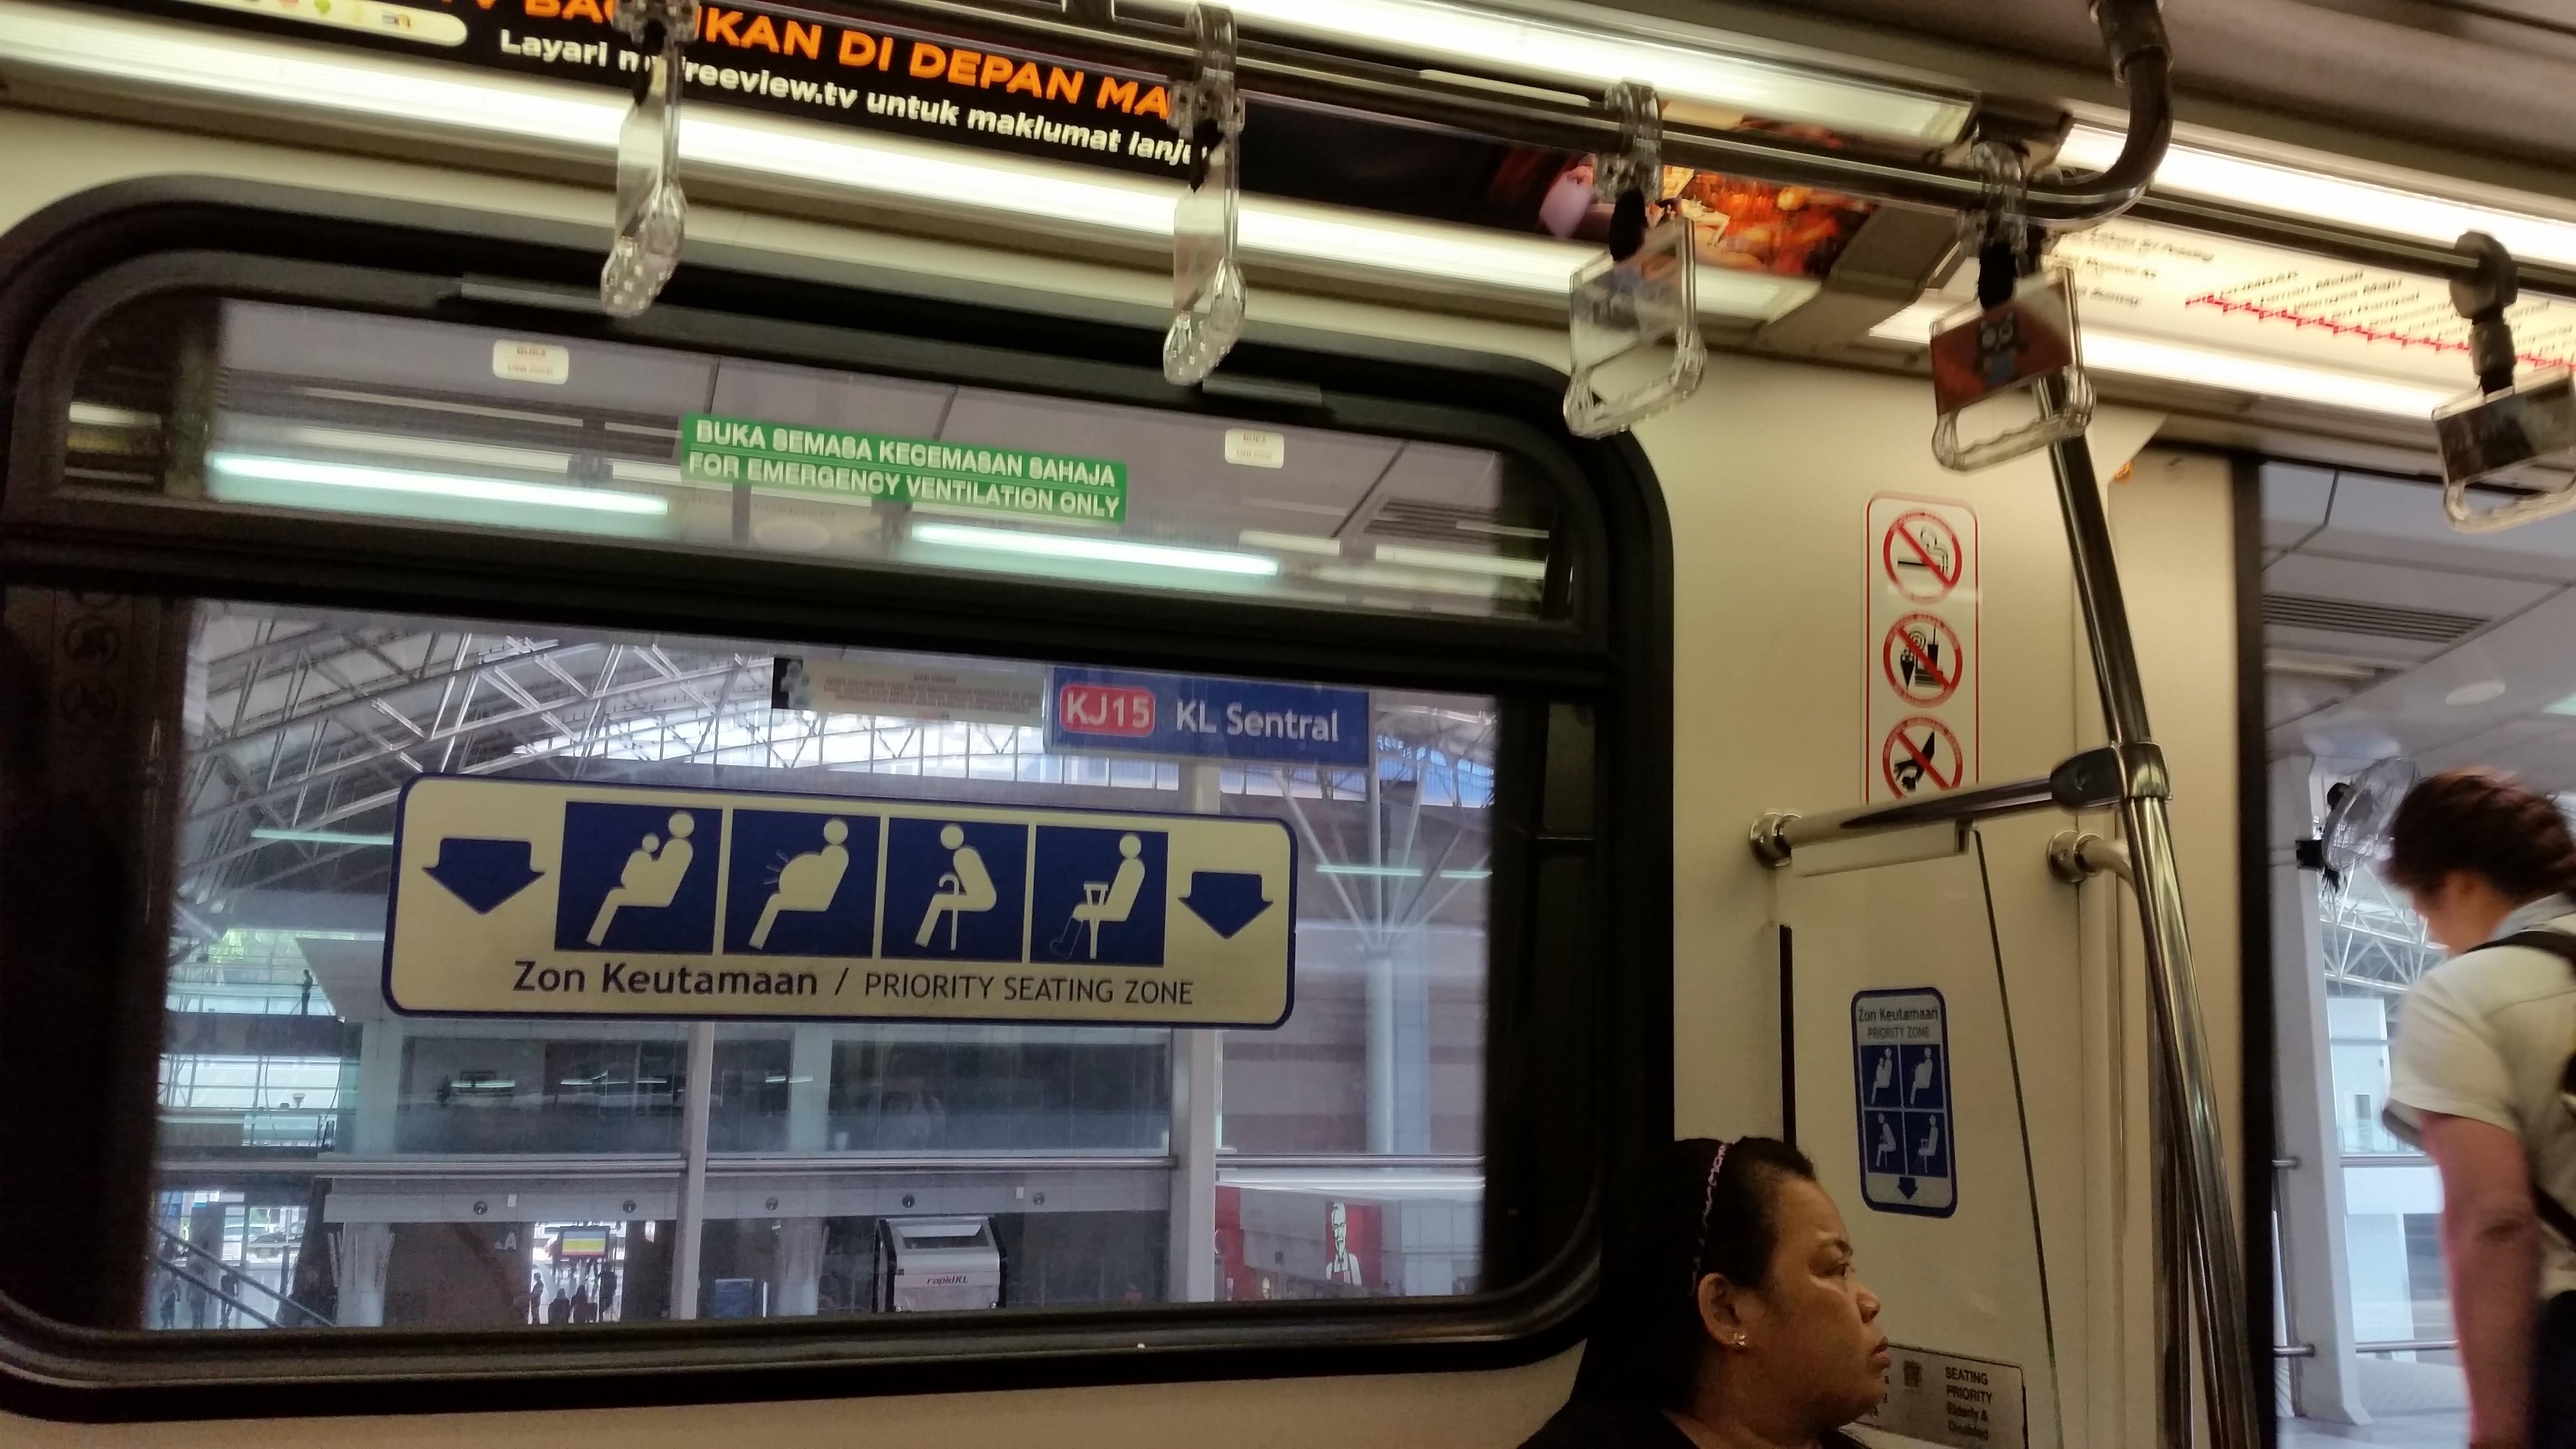 Kl Sentral LRT Station